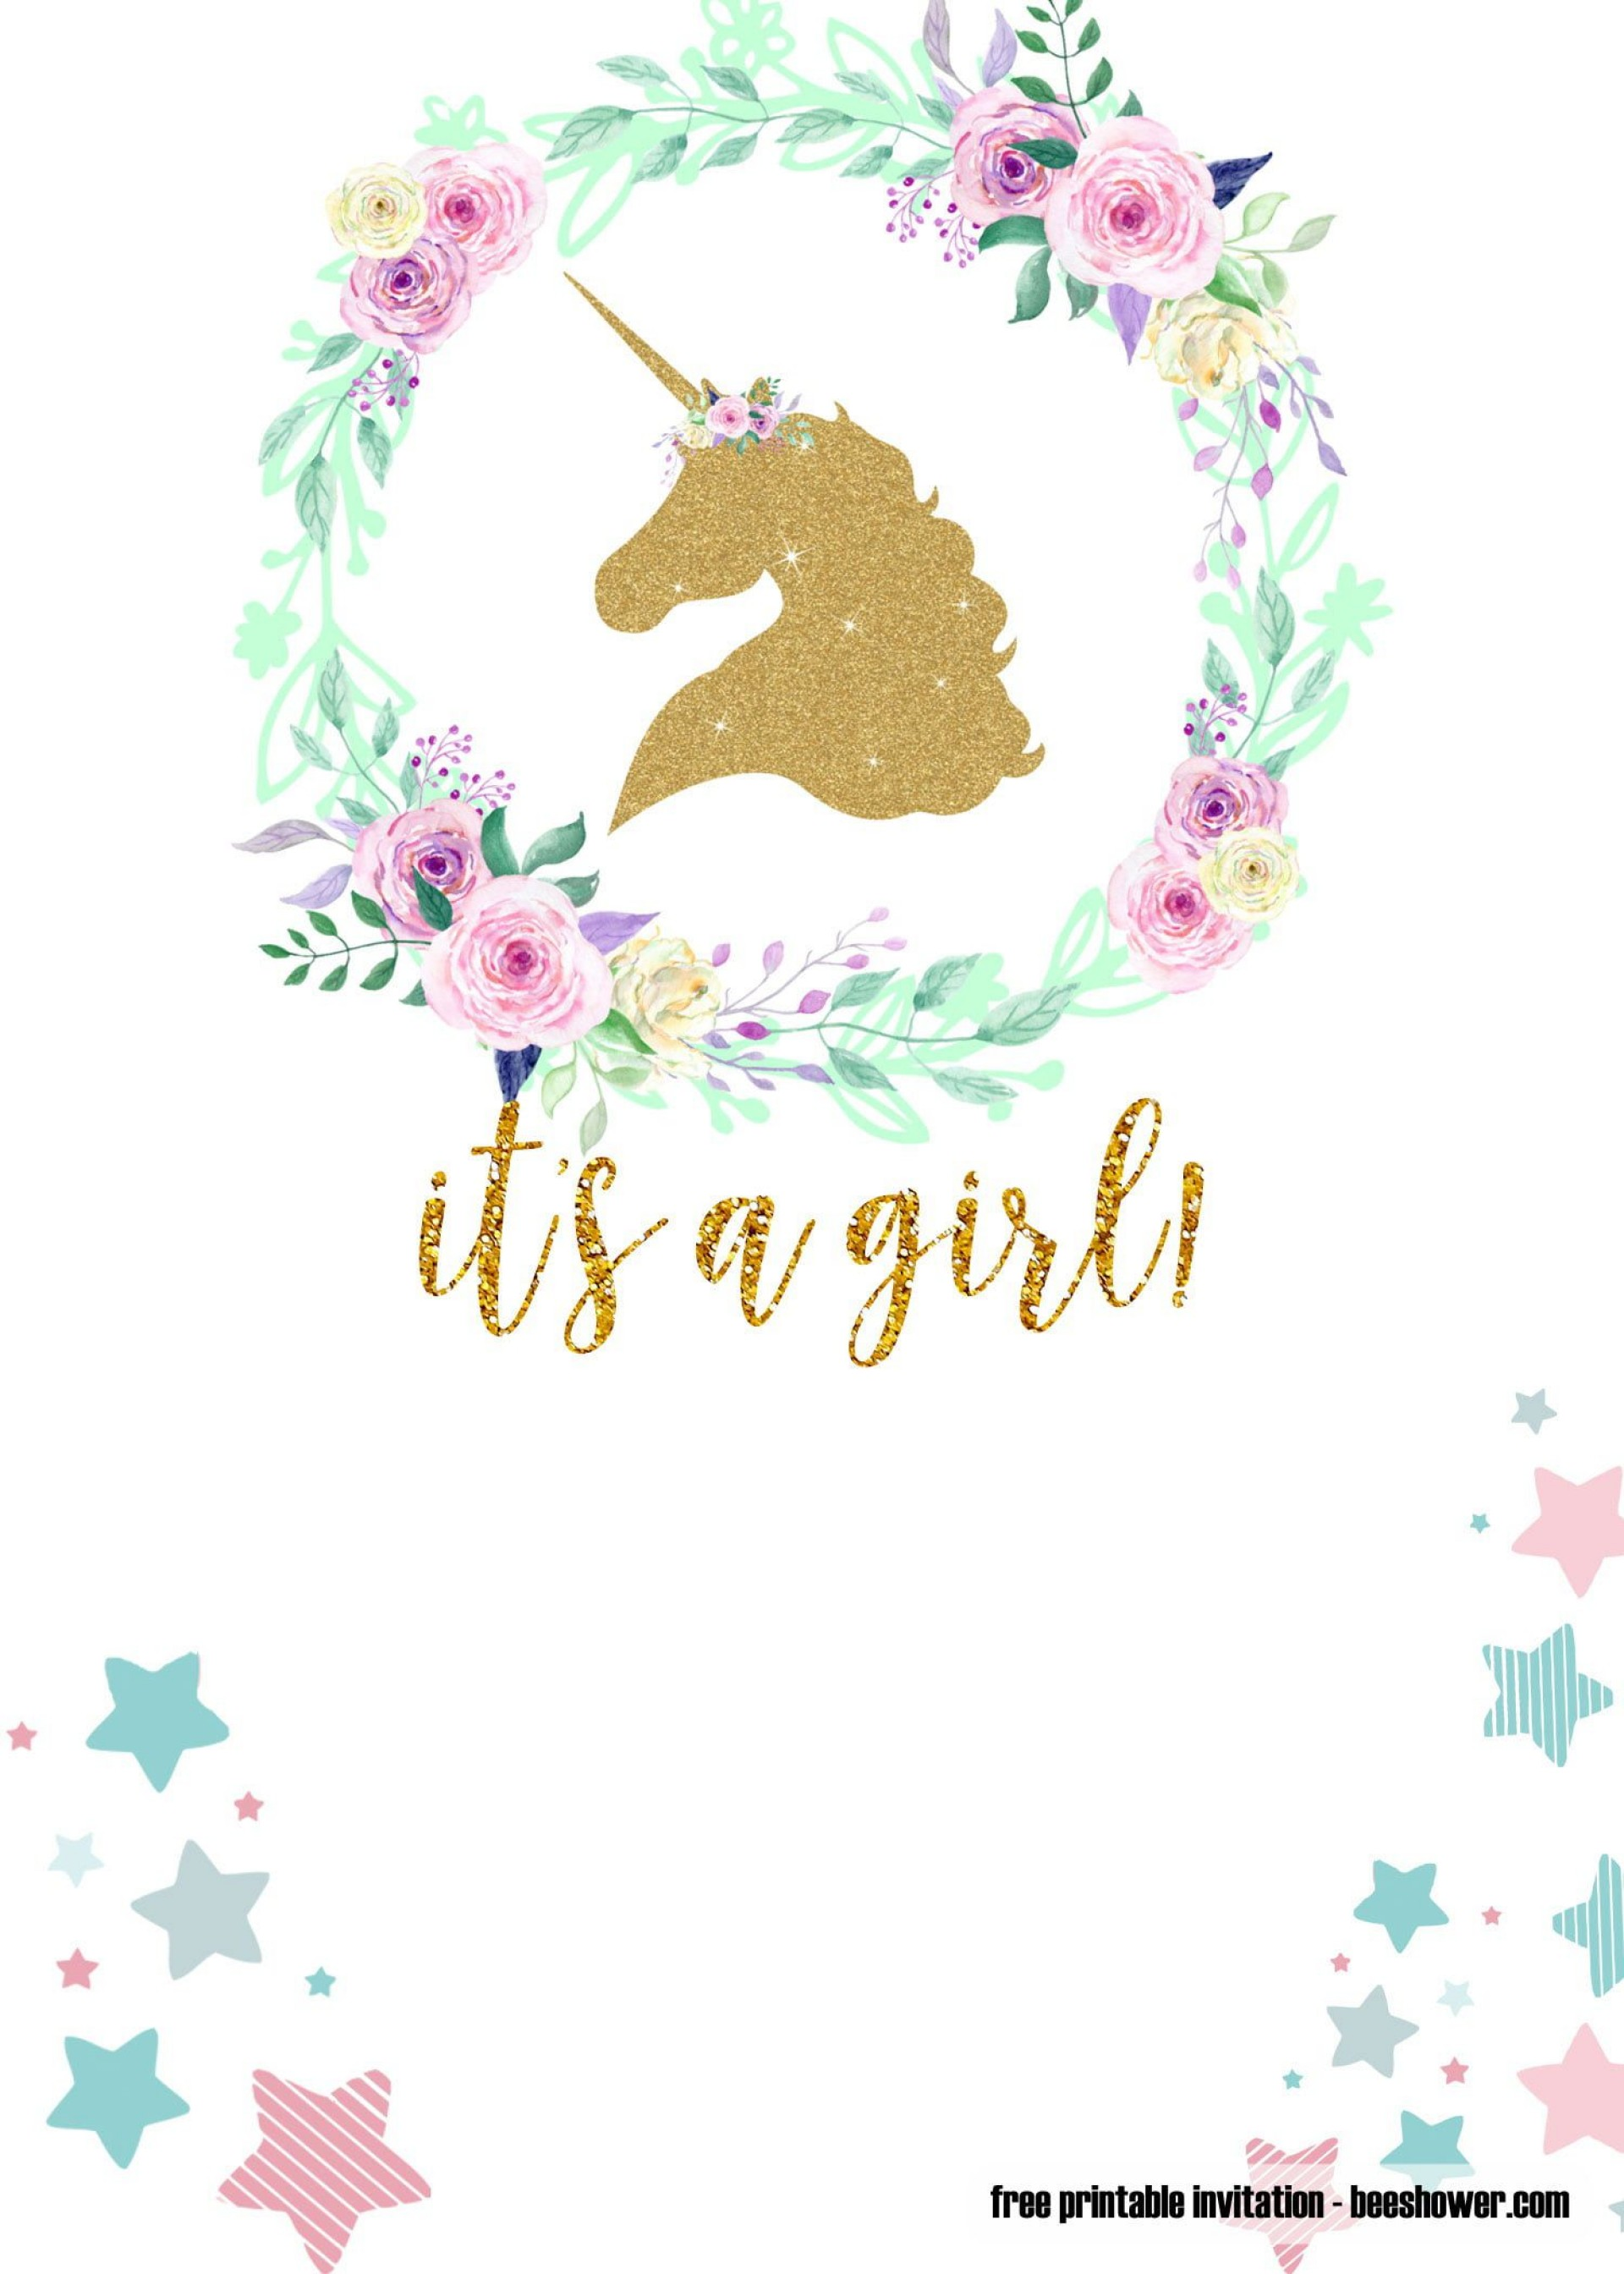 010 Unusual Unicorn Baby Shower Template Free Download Photo  Printable Invitation1920